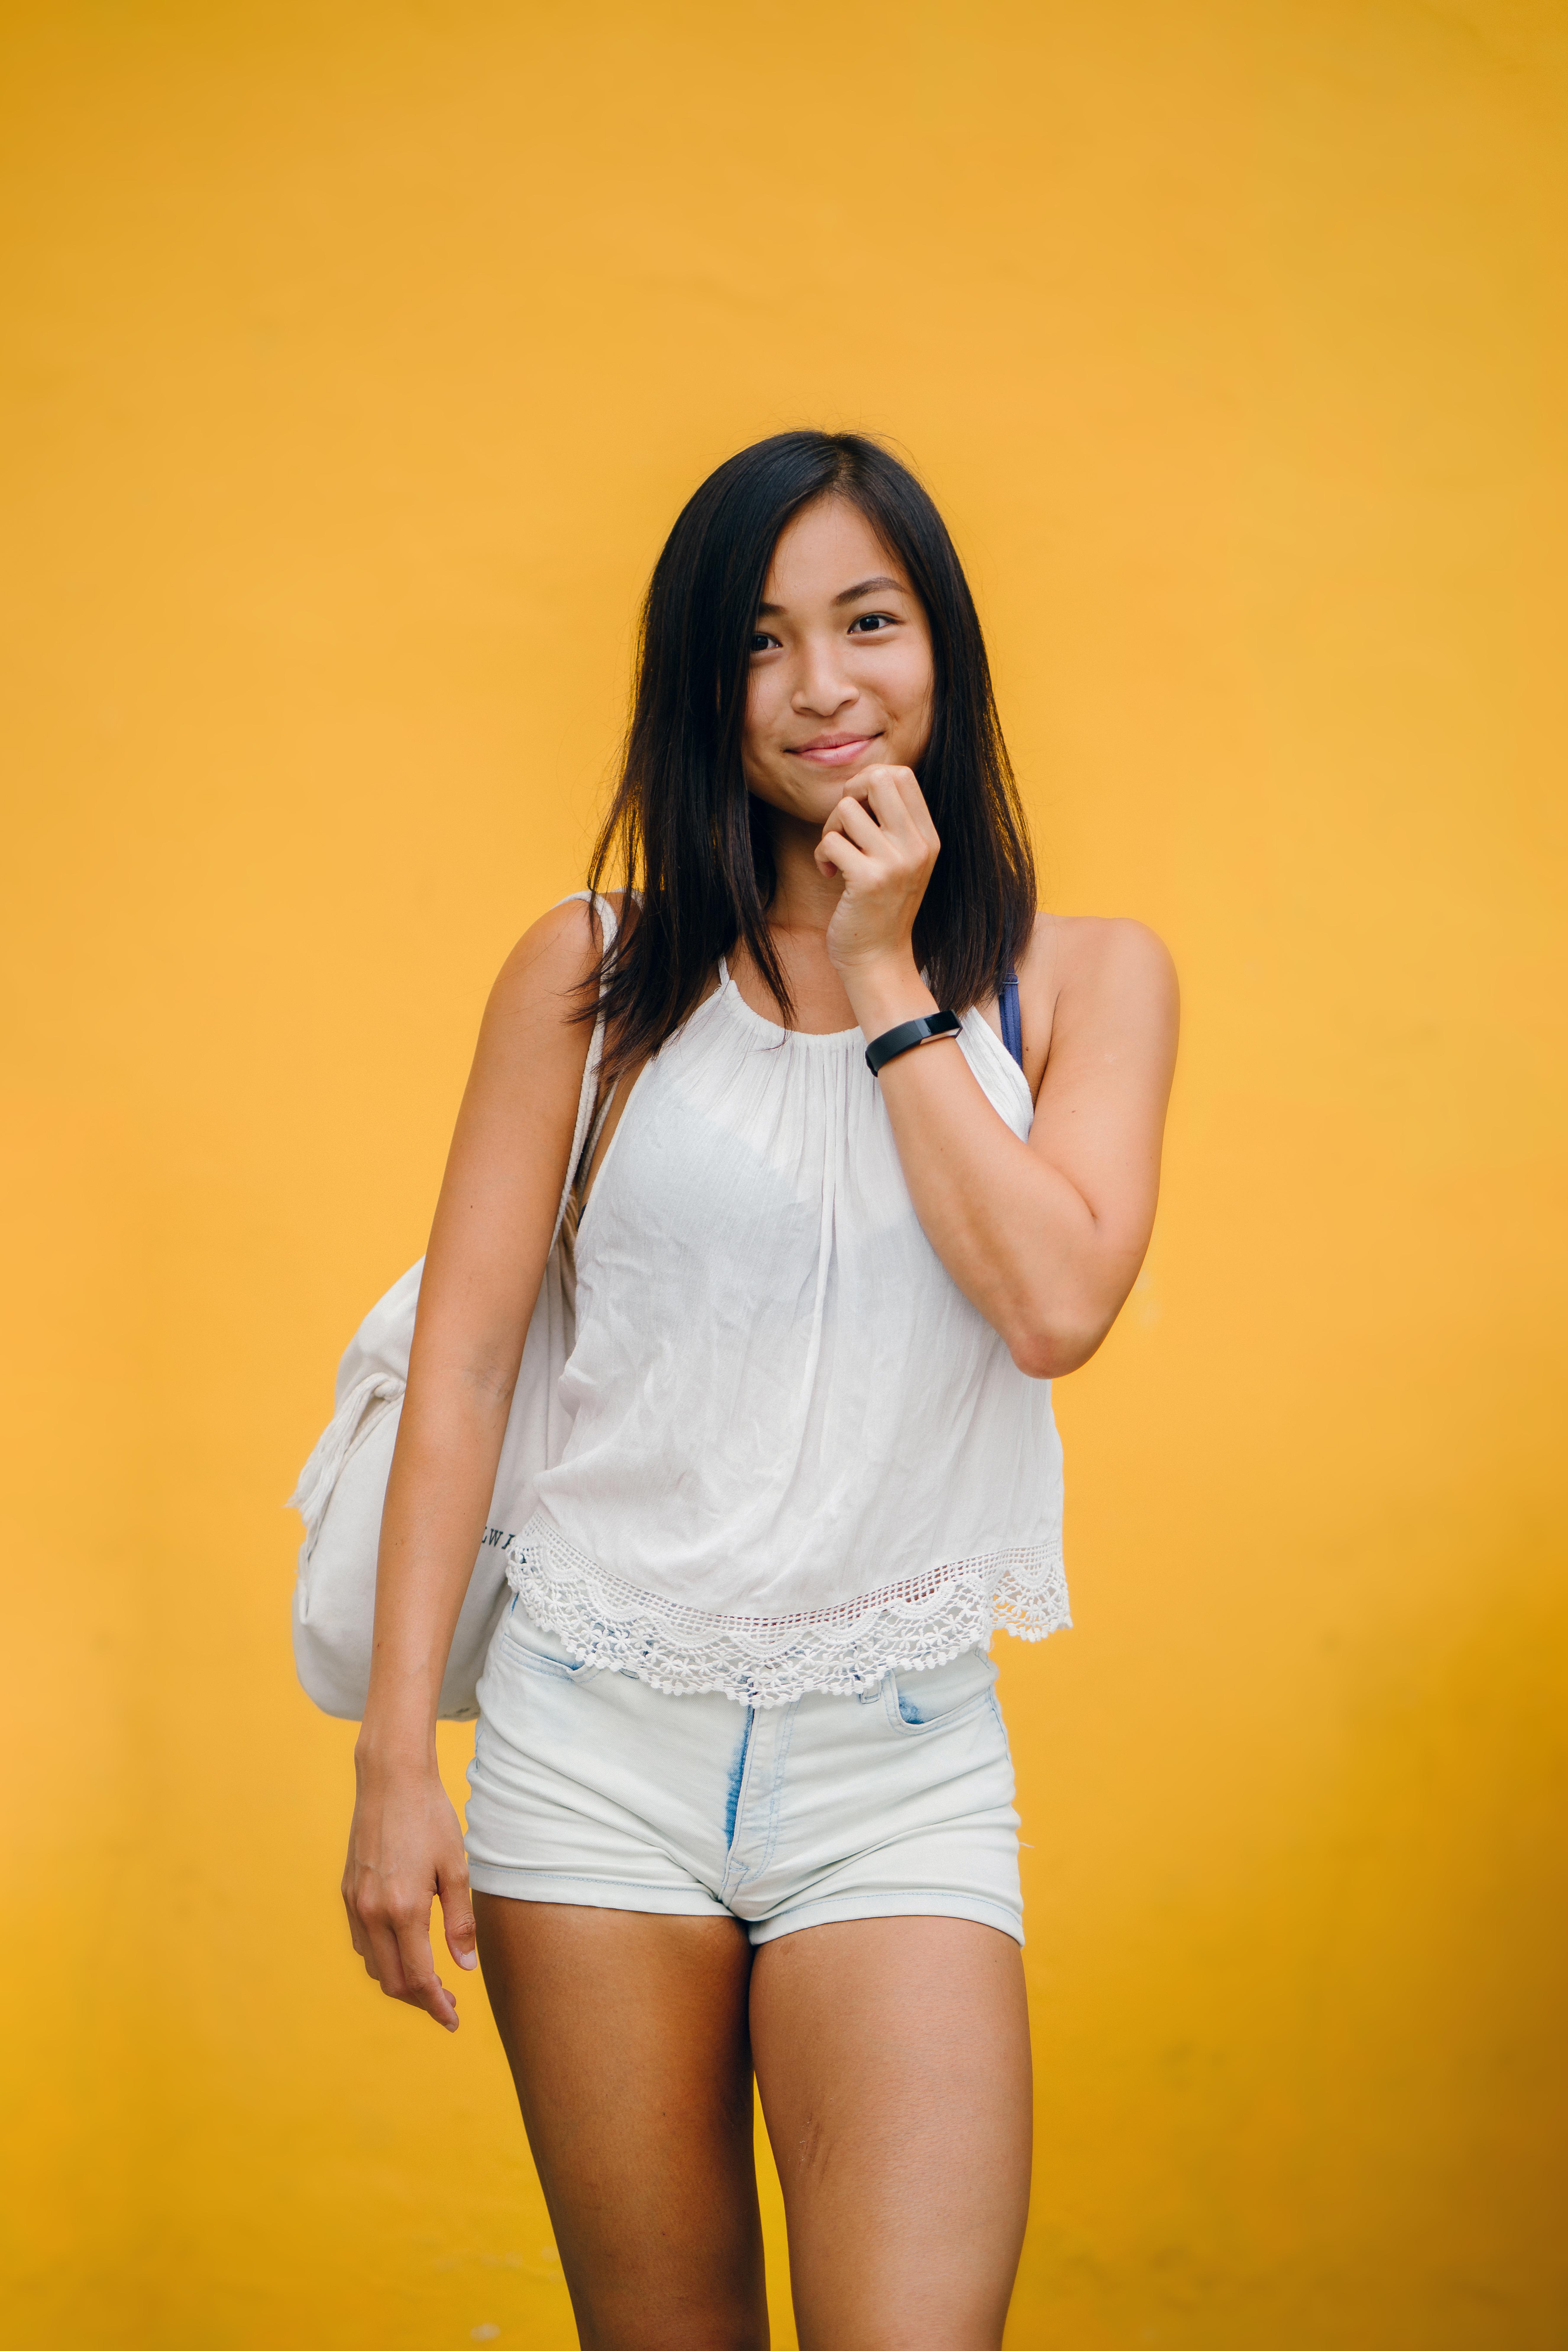 Woman Wearing White Sleeveless Shirt And White Denim Shorts